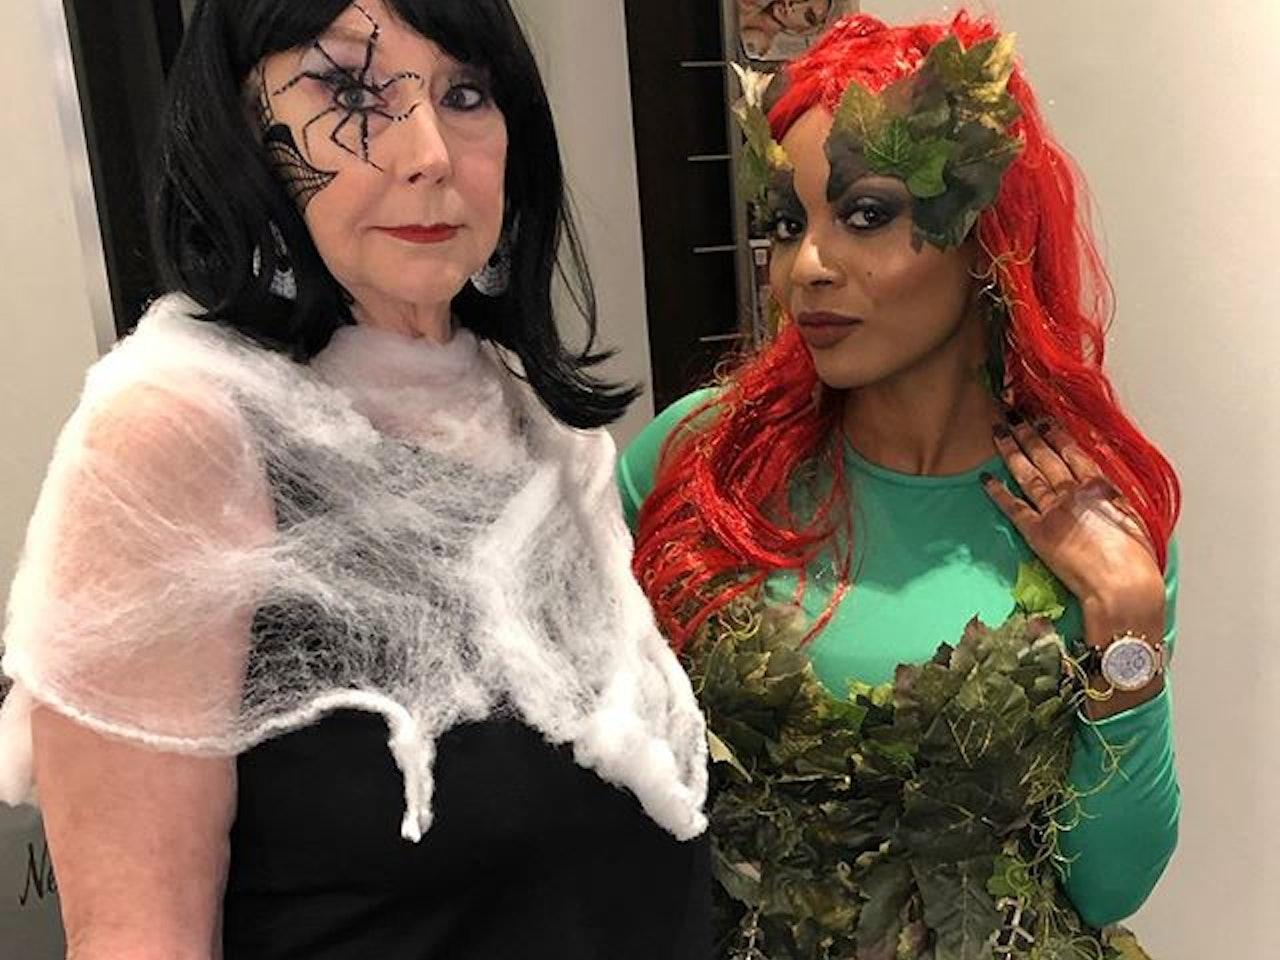 We're both serving face. Yo... what's good. I love my clients! ❤️❤️❤️ #servingface #bothofus #halloween #halloween2019 #poisonivy #redhead #spiderwoman #myndspa @myndspa #transformation #sfx sfxmakeup #dallashalloweenmakeup #spiderwomanmakeup